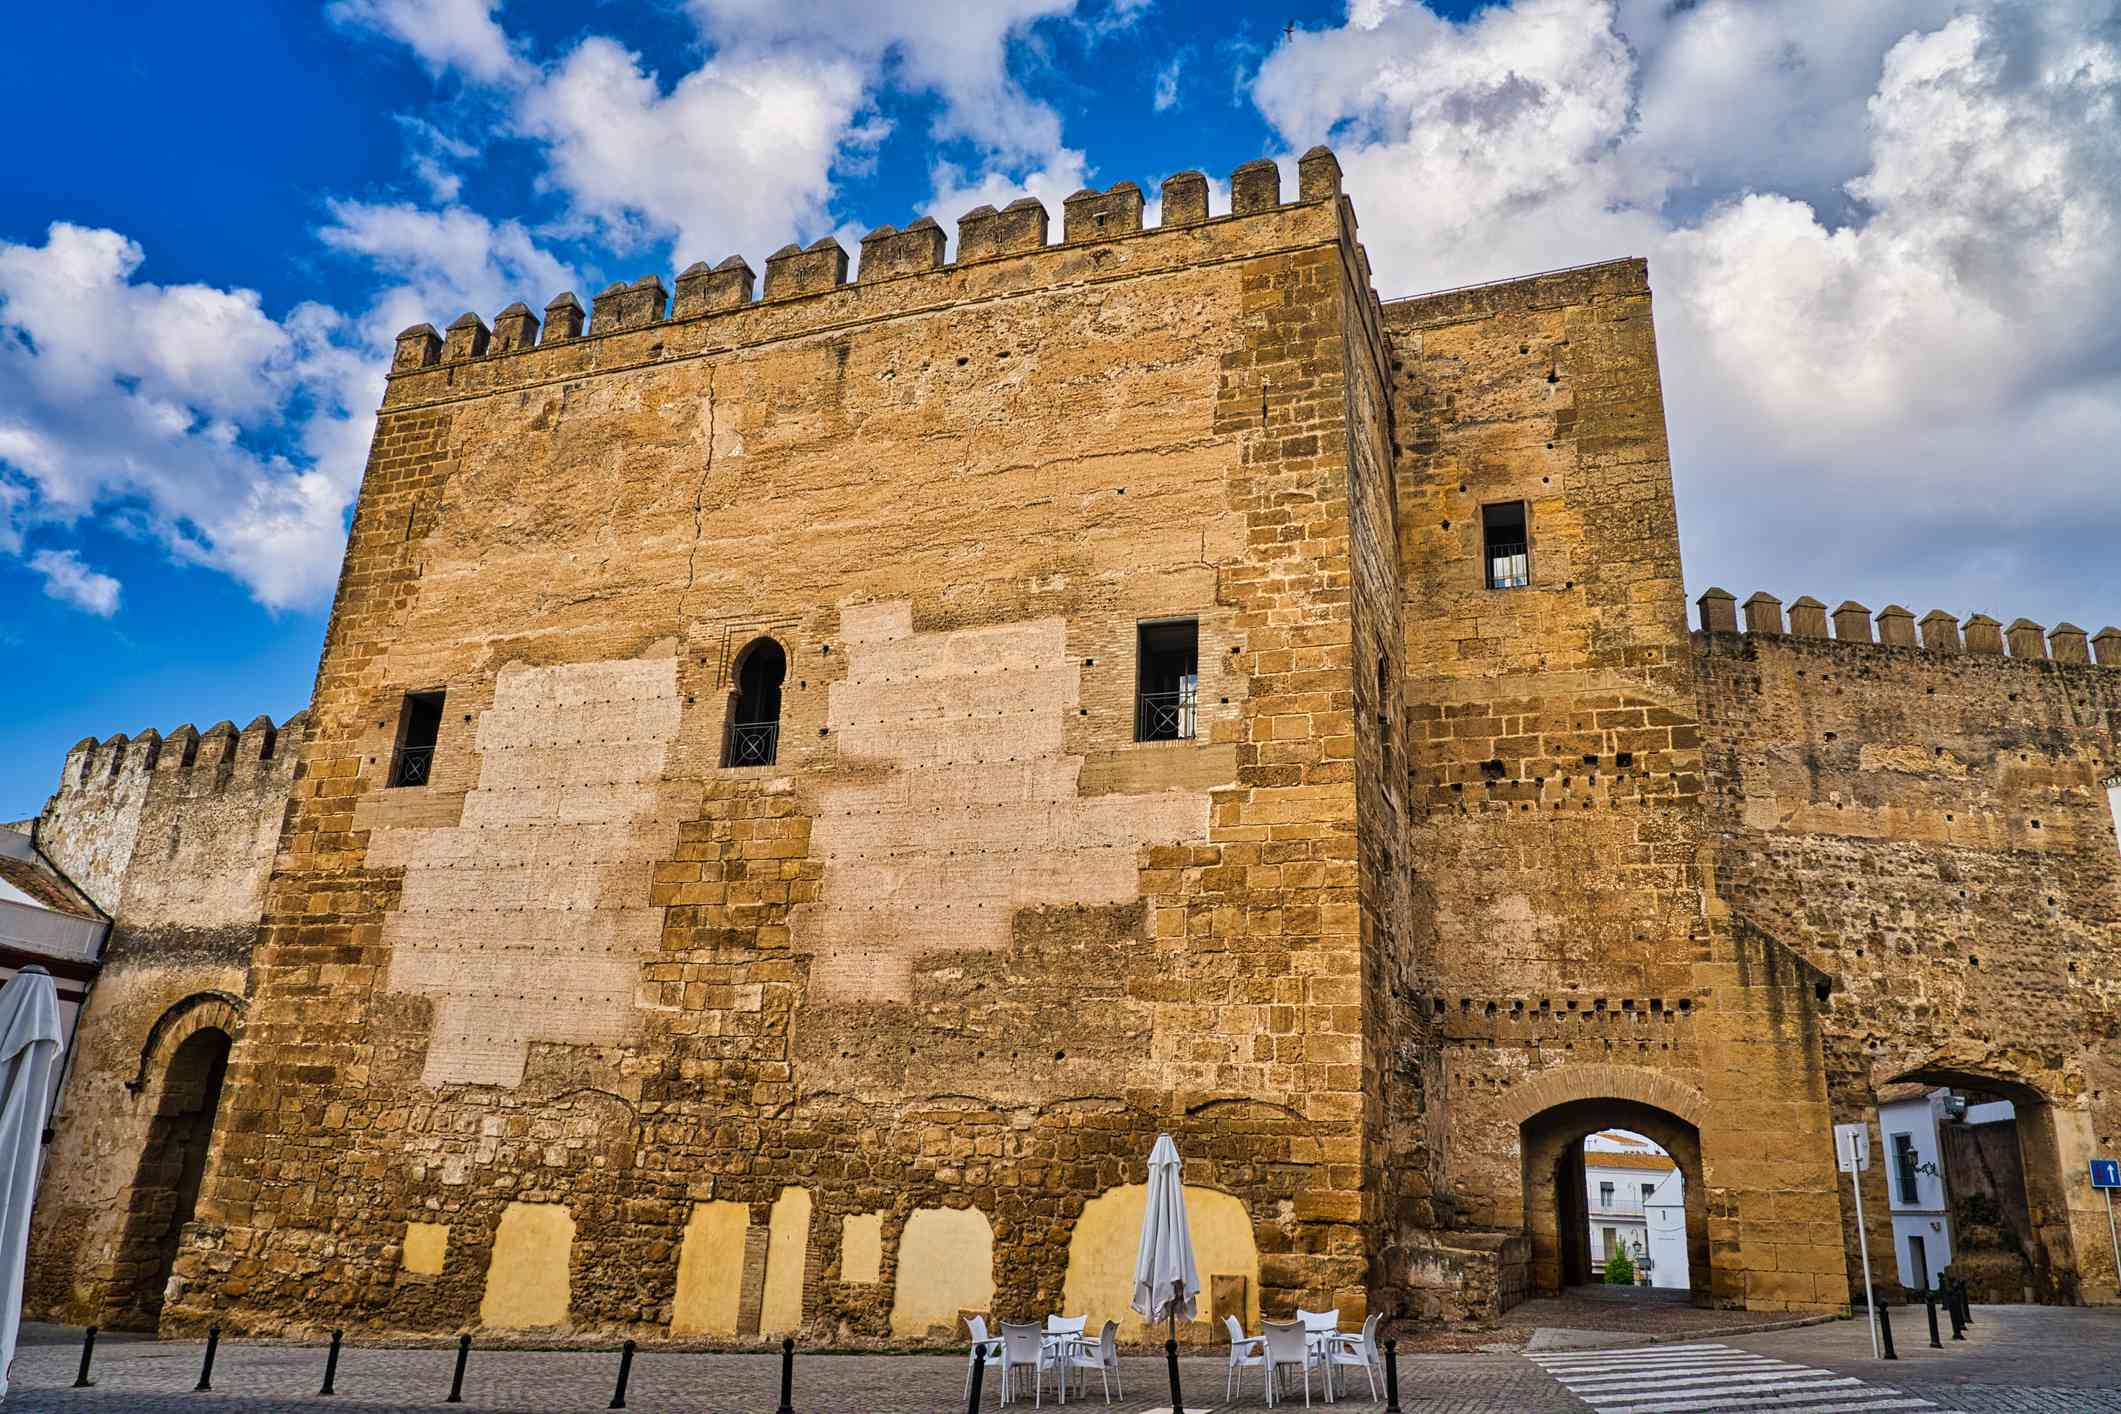 Gate of Sevilla (Puerta de Sevilla) - Carmona, Spain